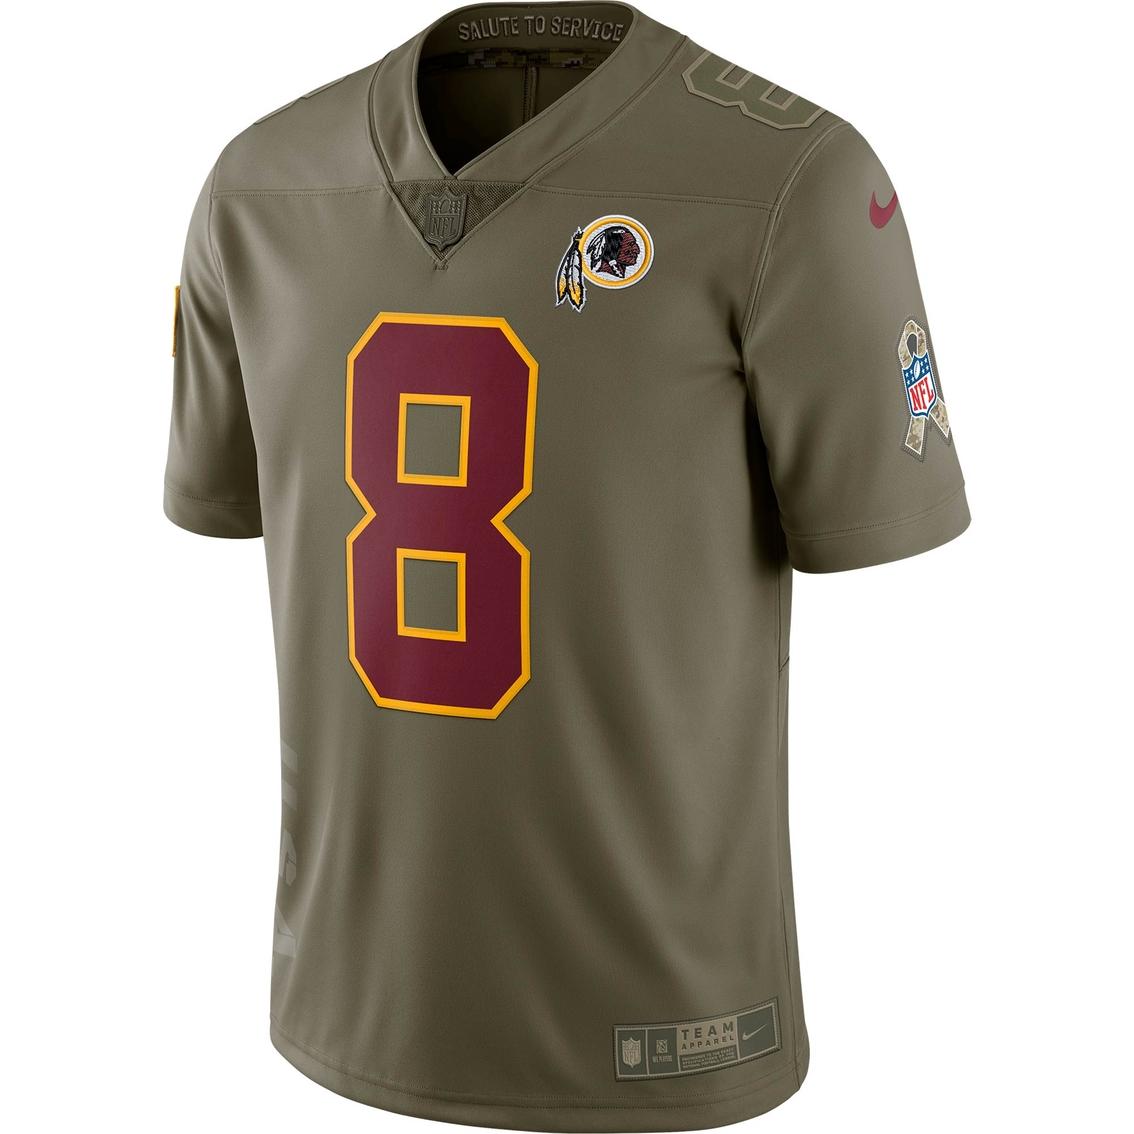 competitive price e0080 308aa Nike Nfl Washington Redskins Cousins Jersey | Jerseys ...